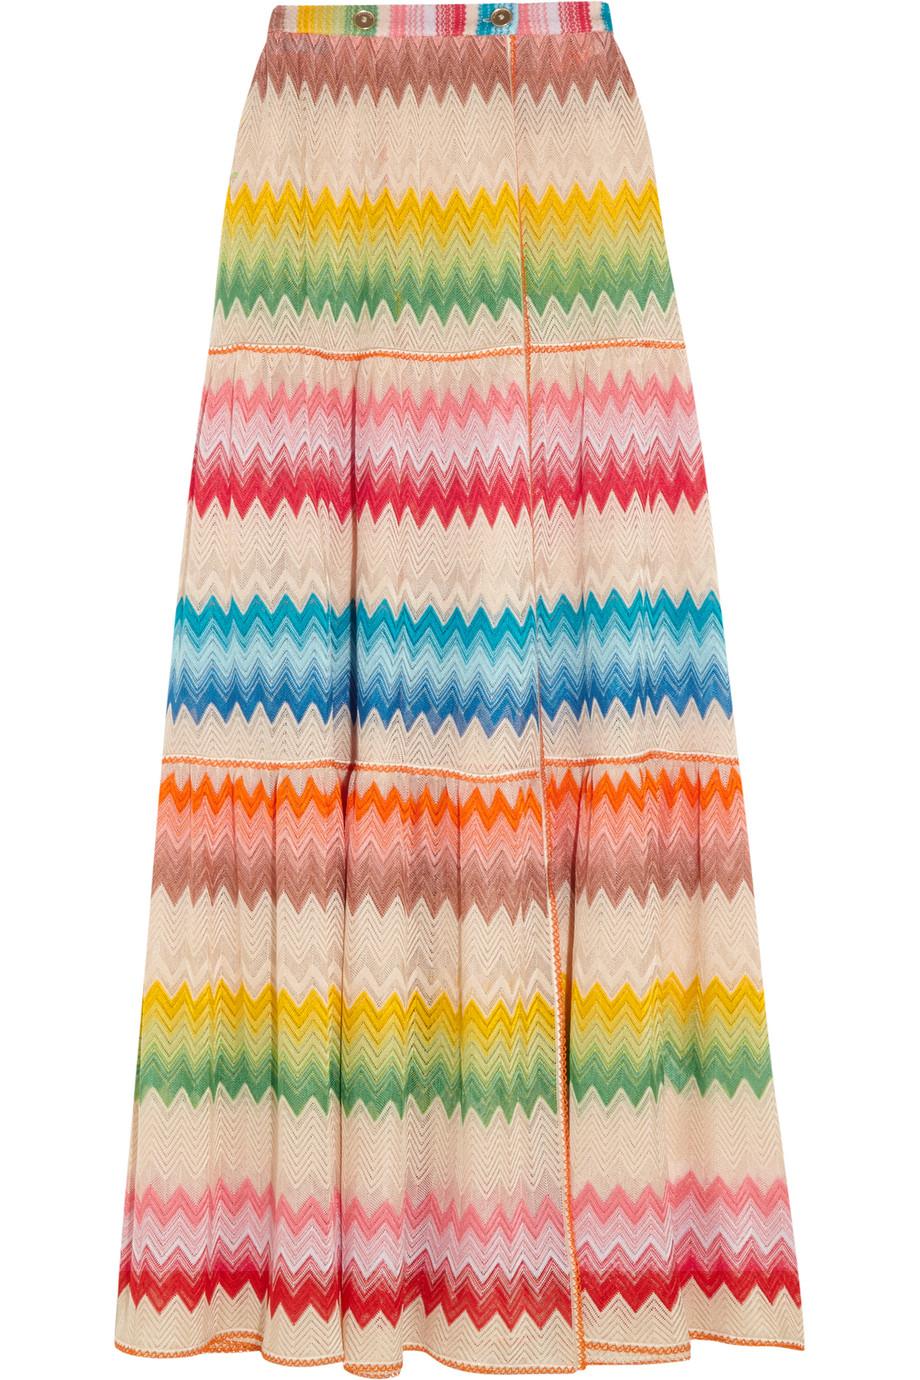 Missoni Mare Crochet-Knit Wrap Maxi Skirt, Pink/Orange, Women's, Size: 42